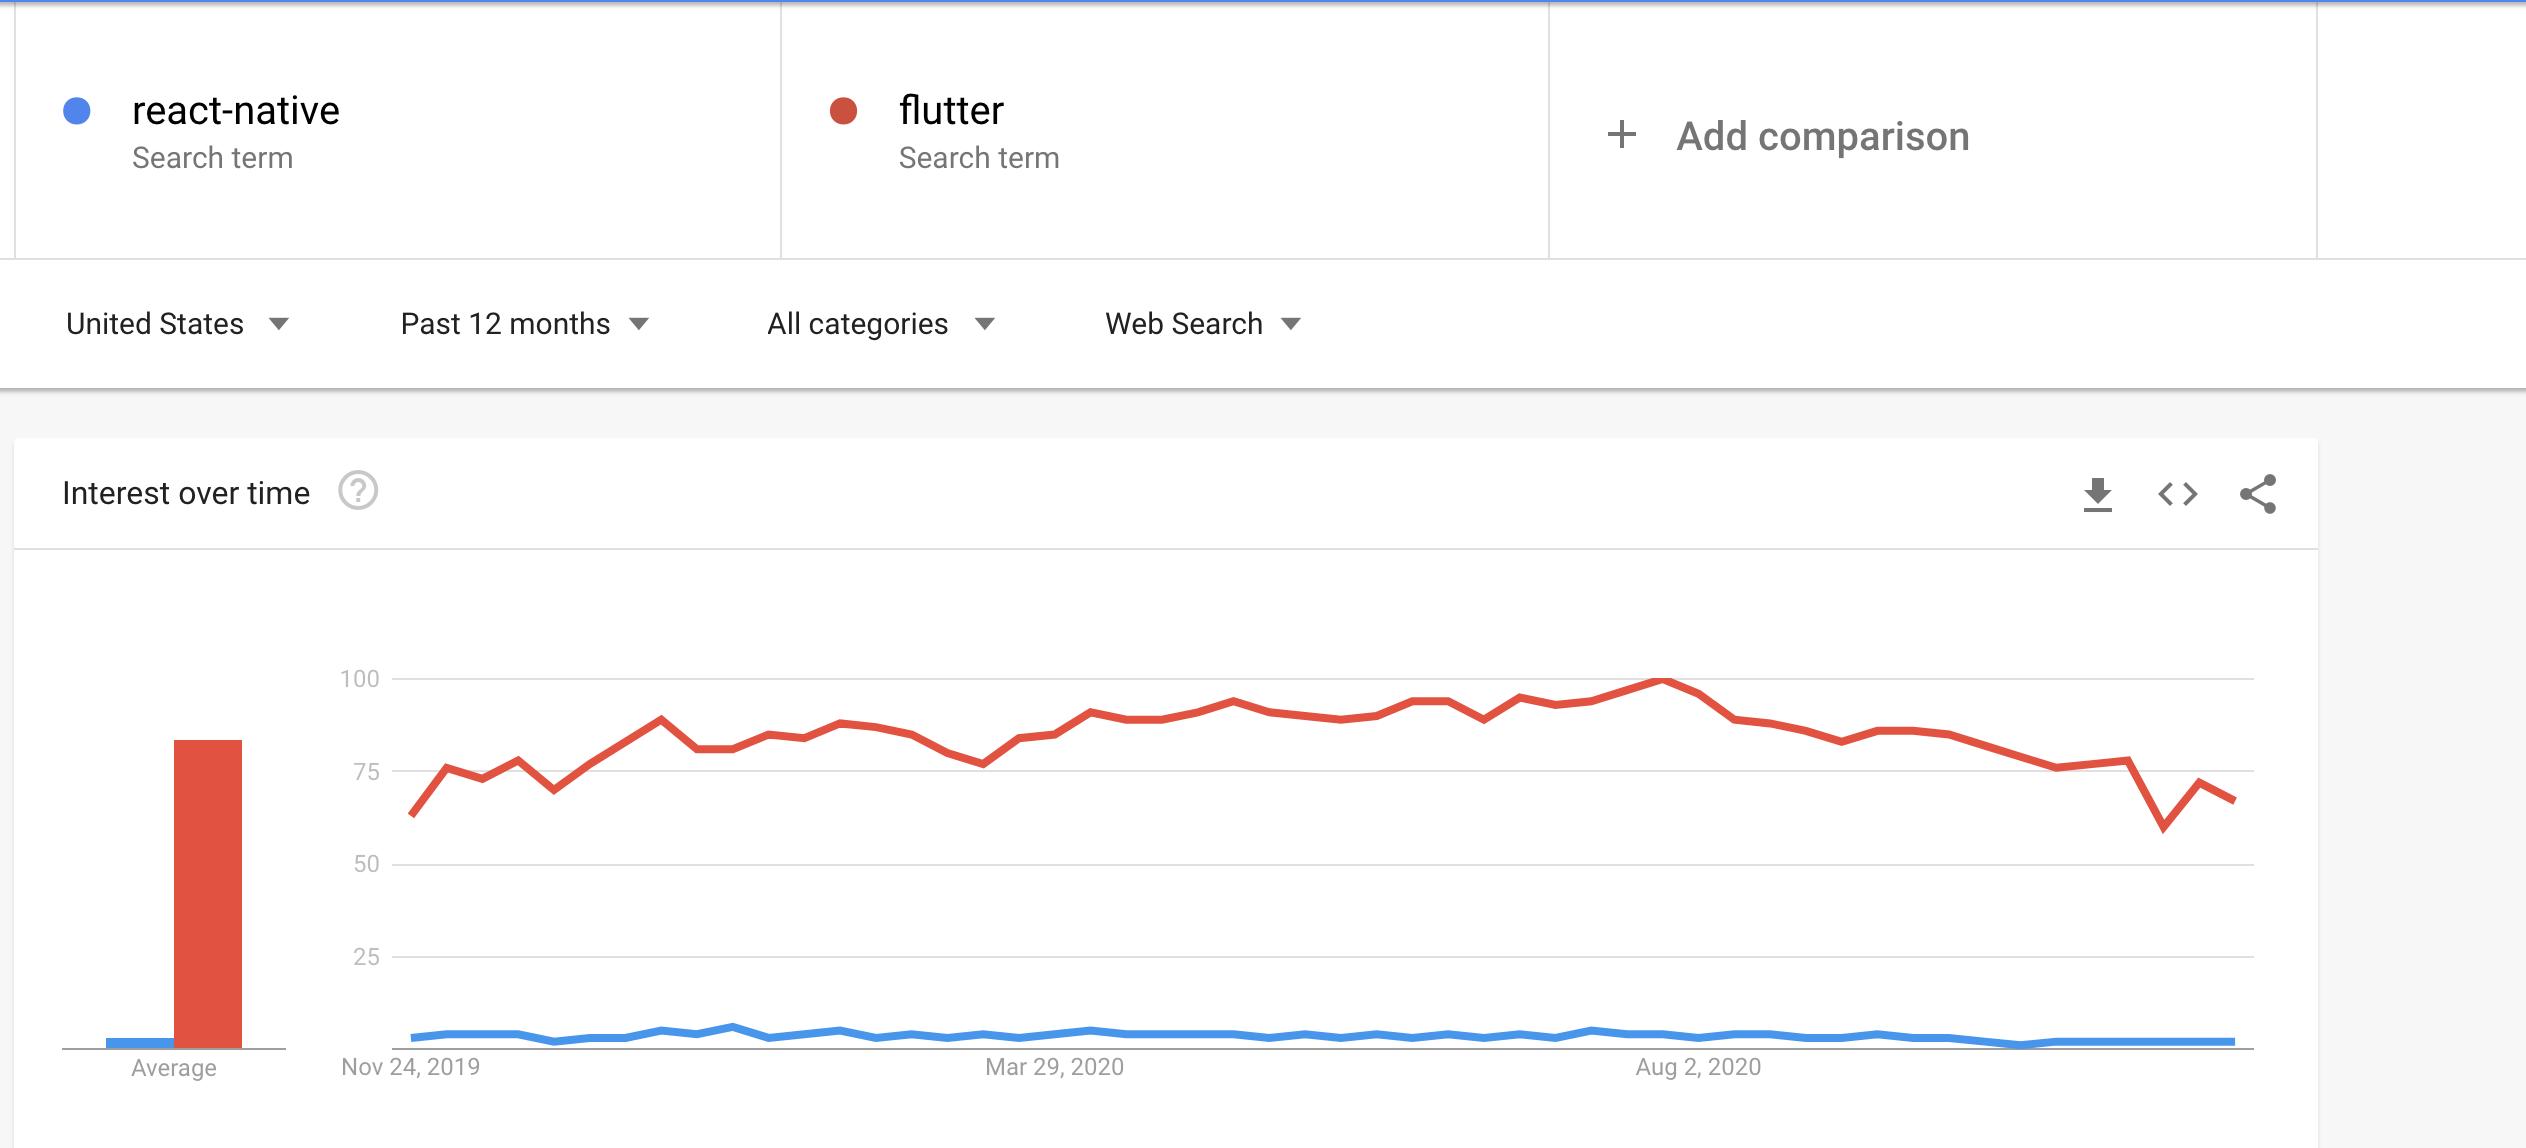 https://trends.google.com/trends/explore?geo=US&q=react-native,flutter